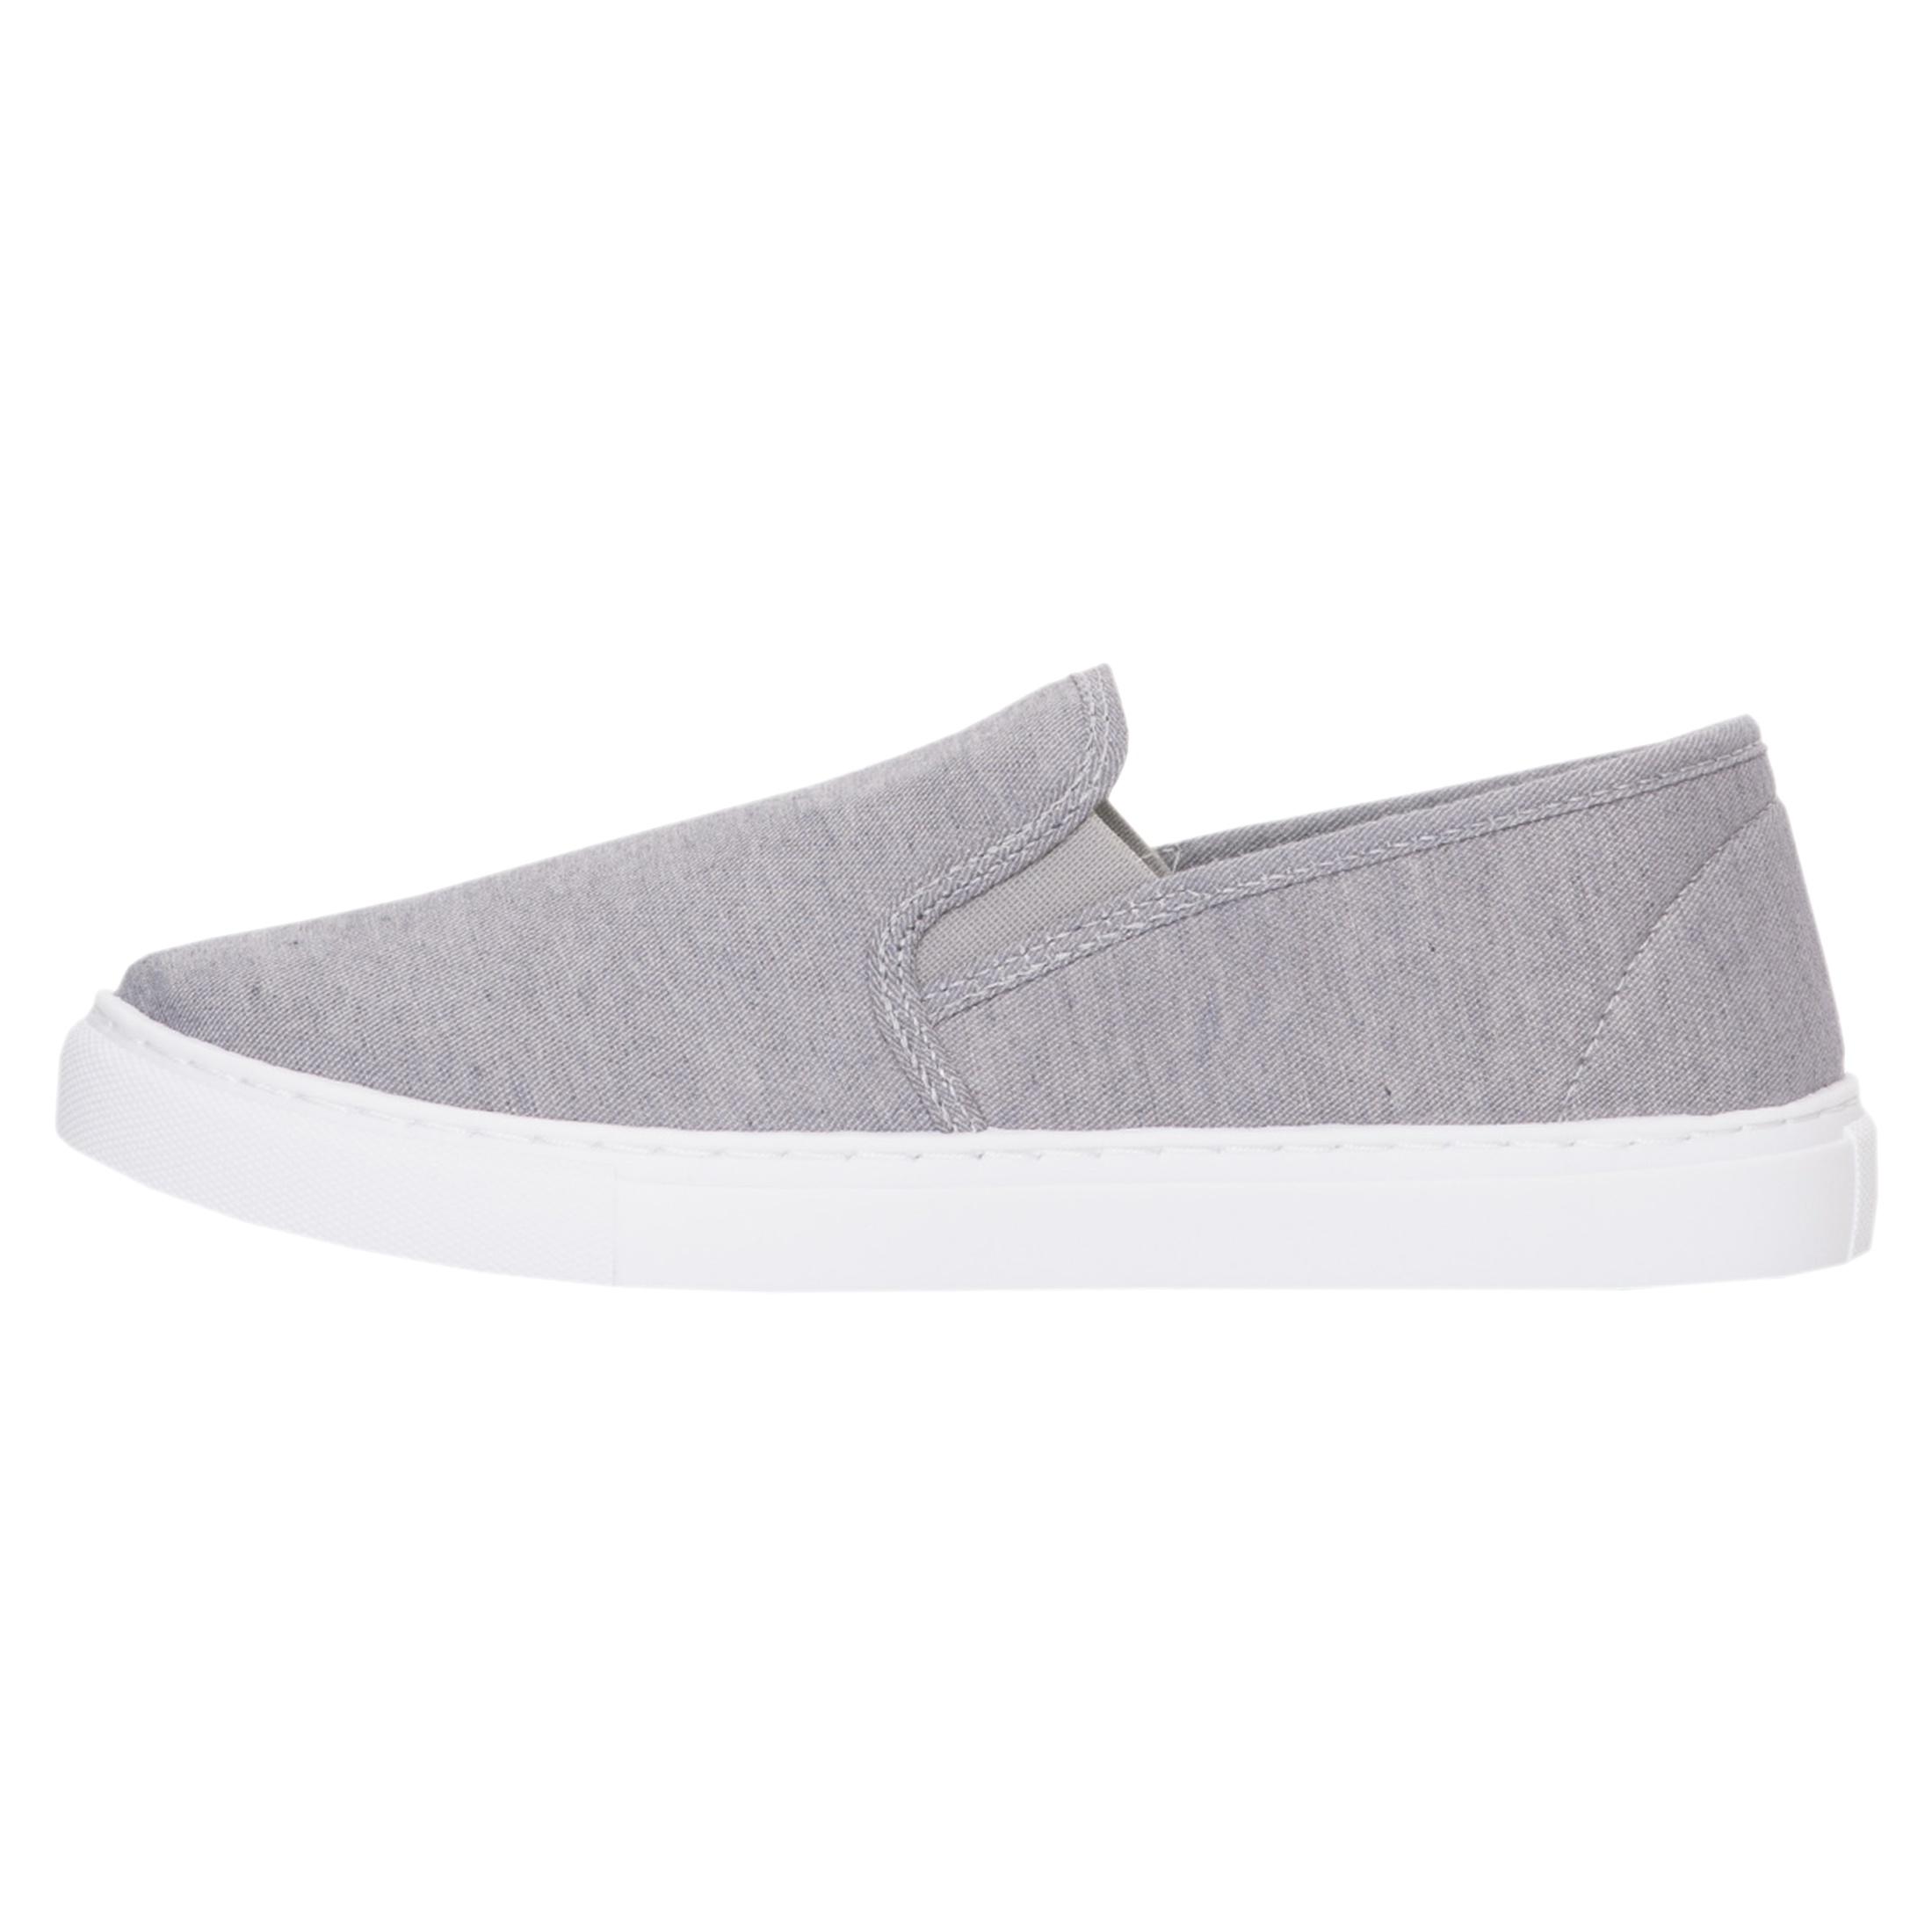 کفش روزمره مردانه ال سی وایکیکی کد 9S2684Z8 - CWL